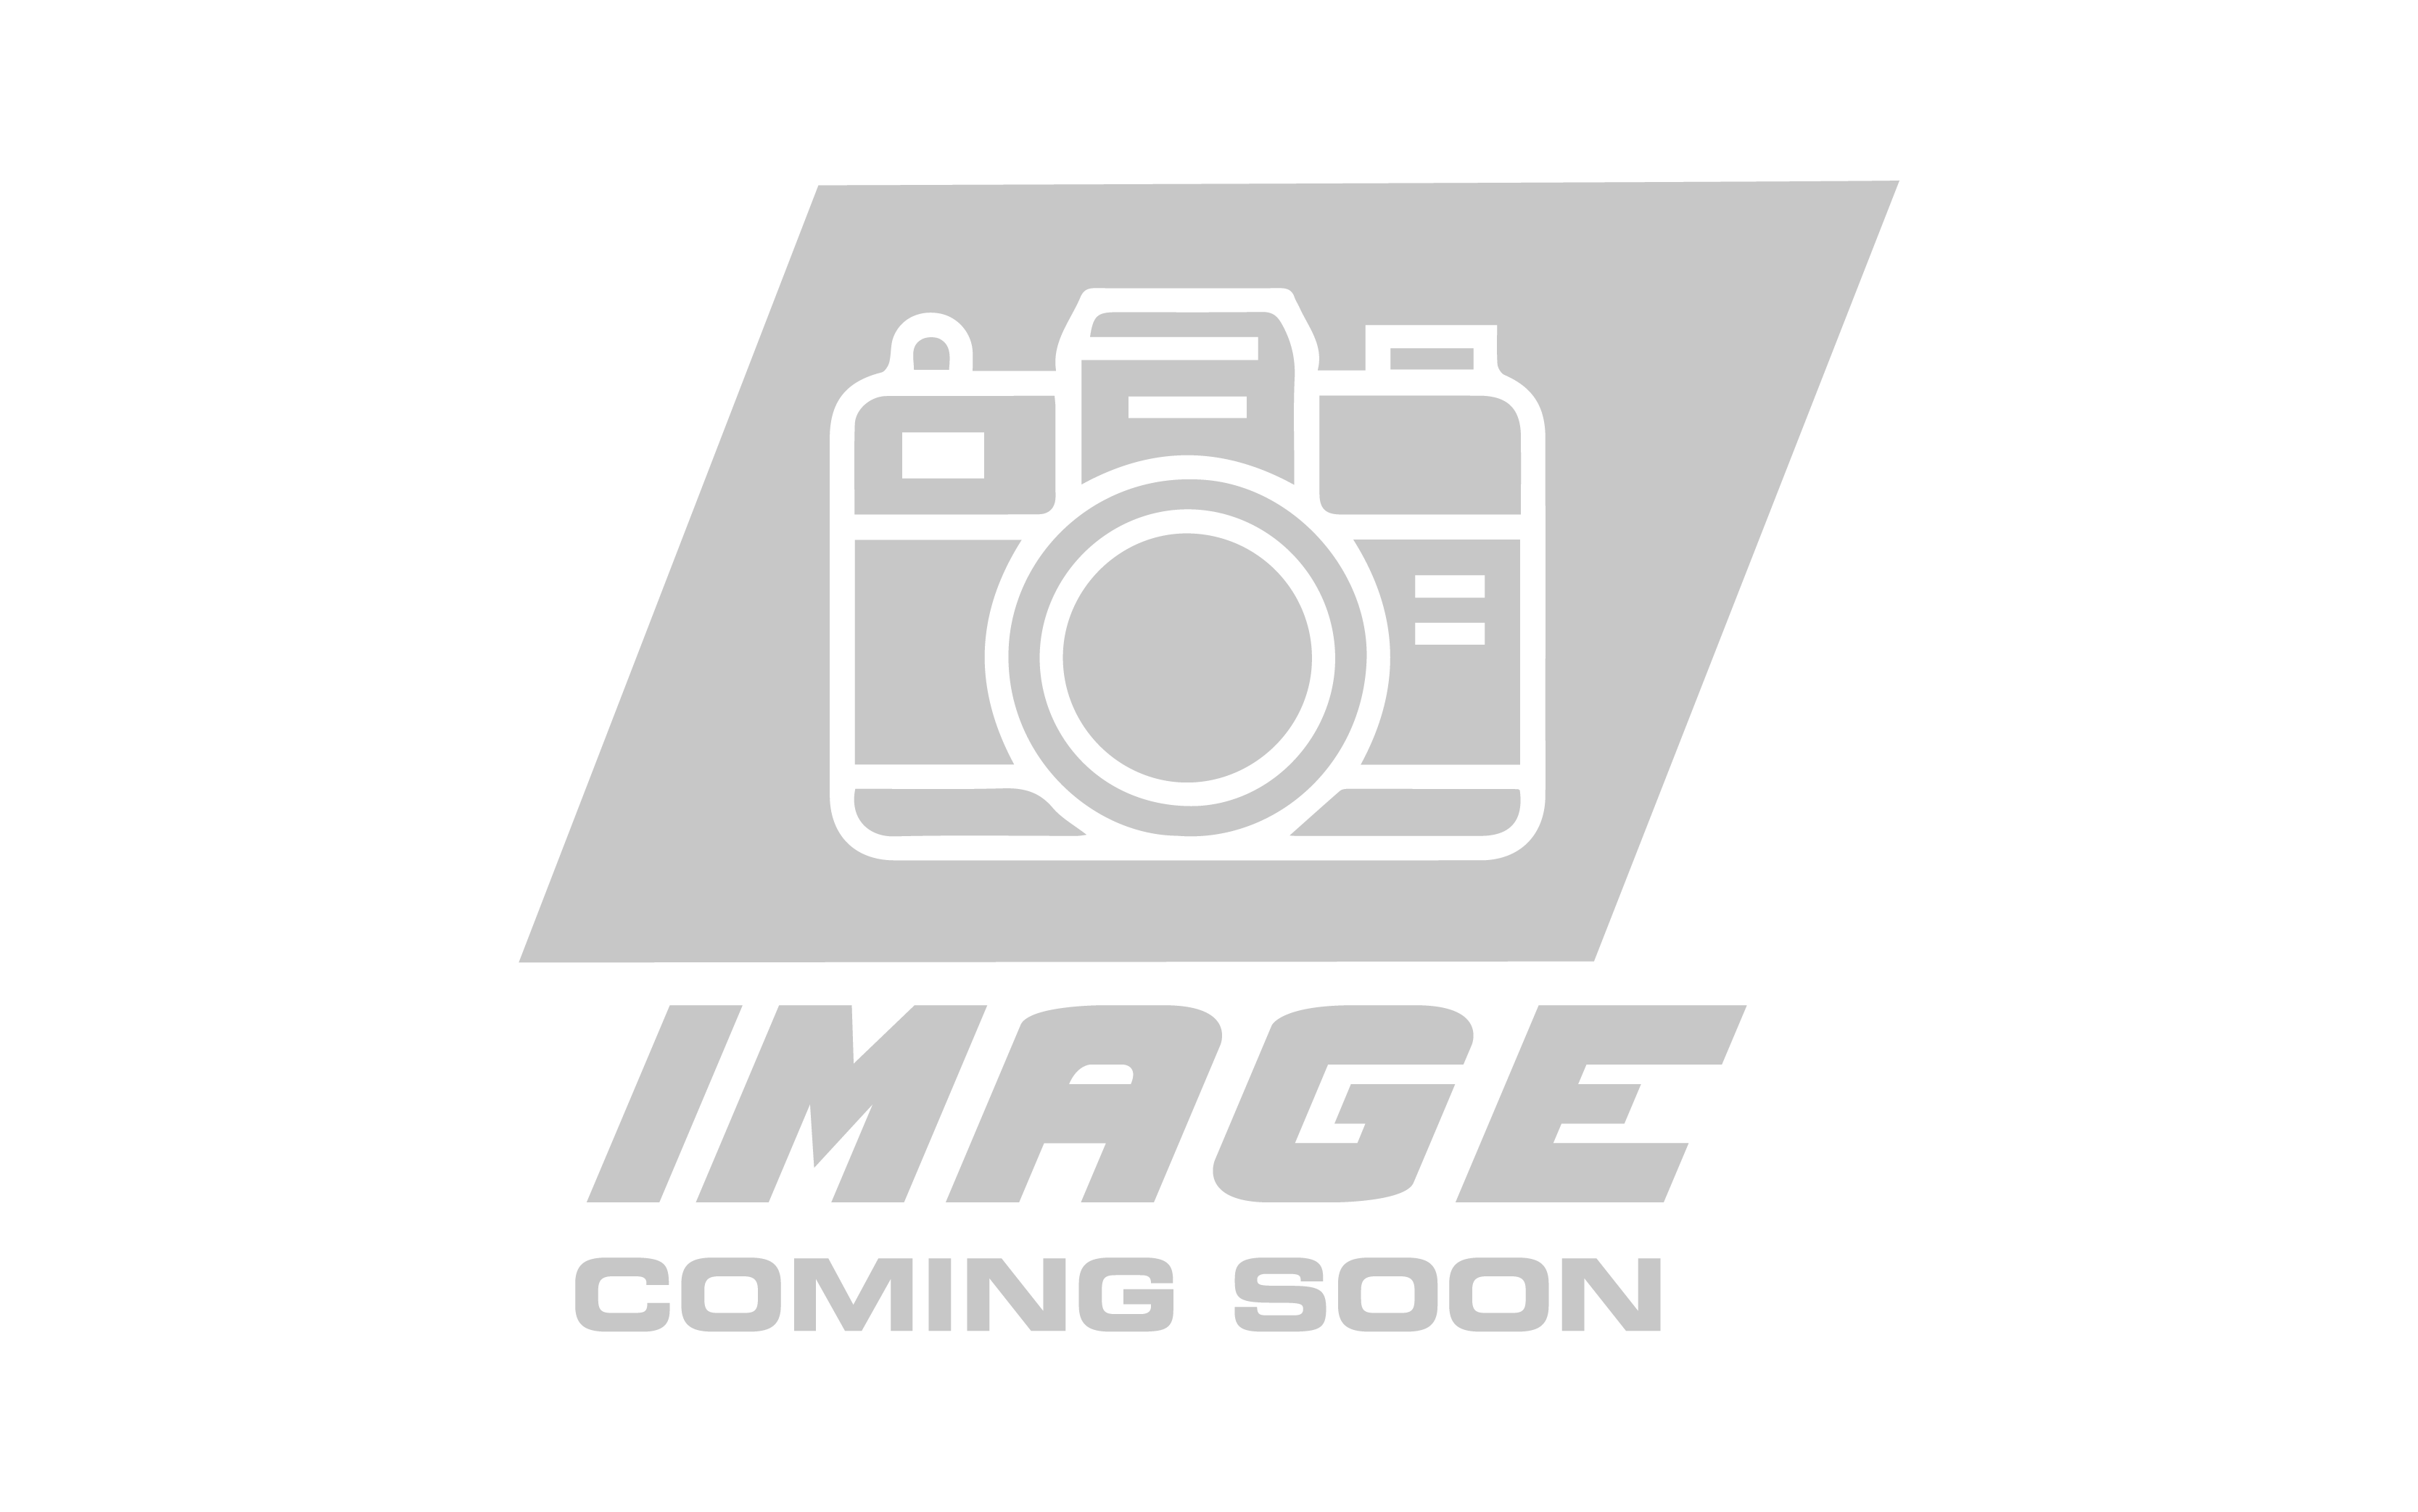 dodge_ram_ford_f150_f250_chevrolet_2500_gmc_c10_air_lift_loadlifter_5000_ultimate_bag_88215